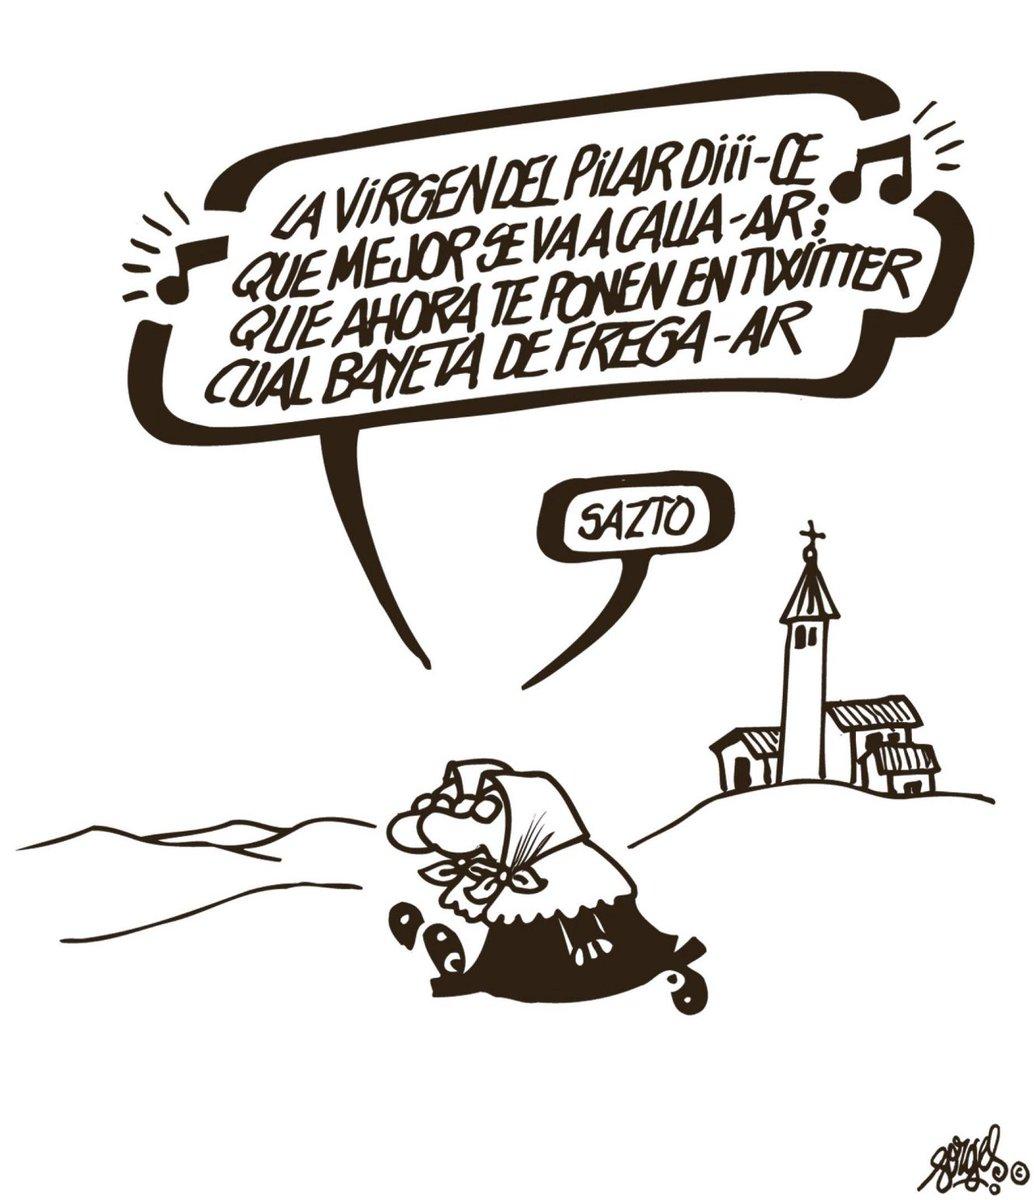 #12Oct   x     FORGES      #Portada #Portadas #EnPortada #FelizJueves #YaVieneRepública #ARVcatLaRespuesta<br>http://pic.twitter.com/ZTfdUn5hZK